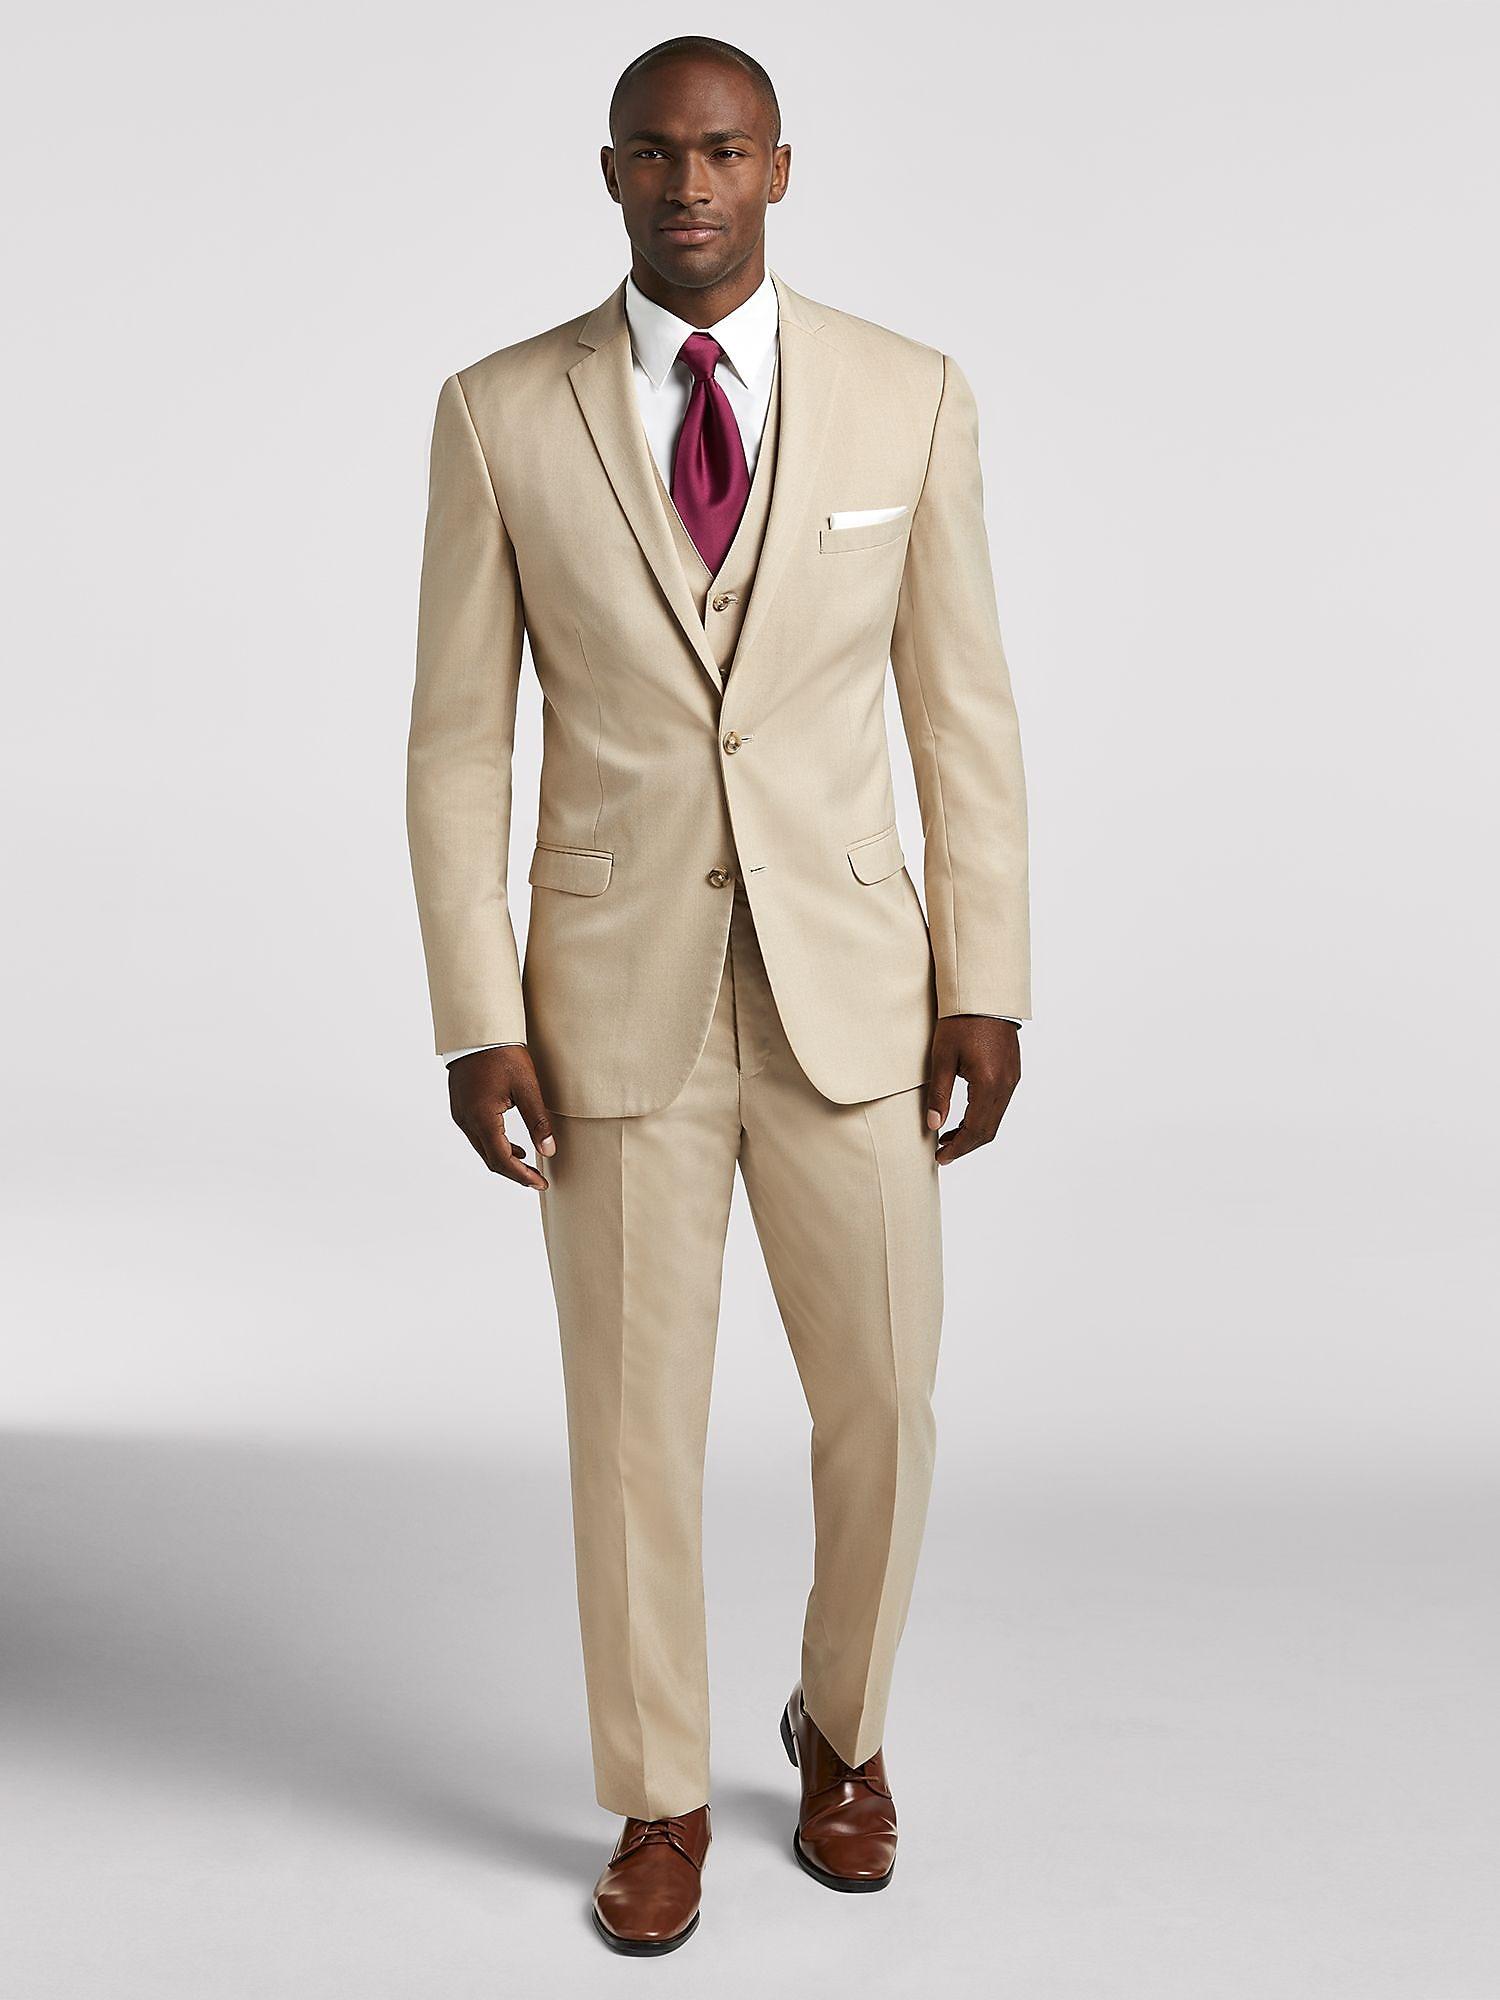 a1540985266 Tuxedo Rental